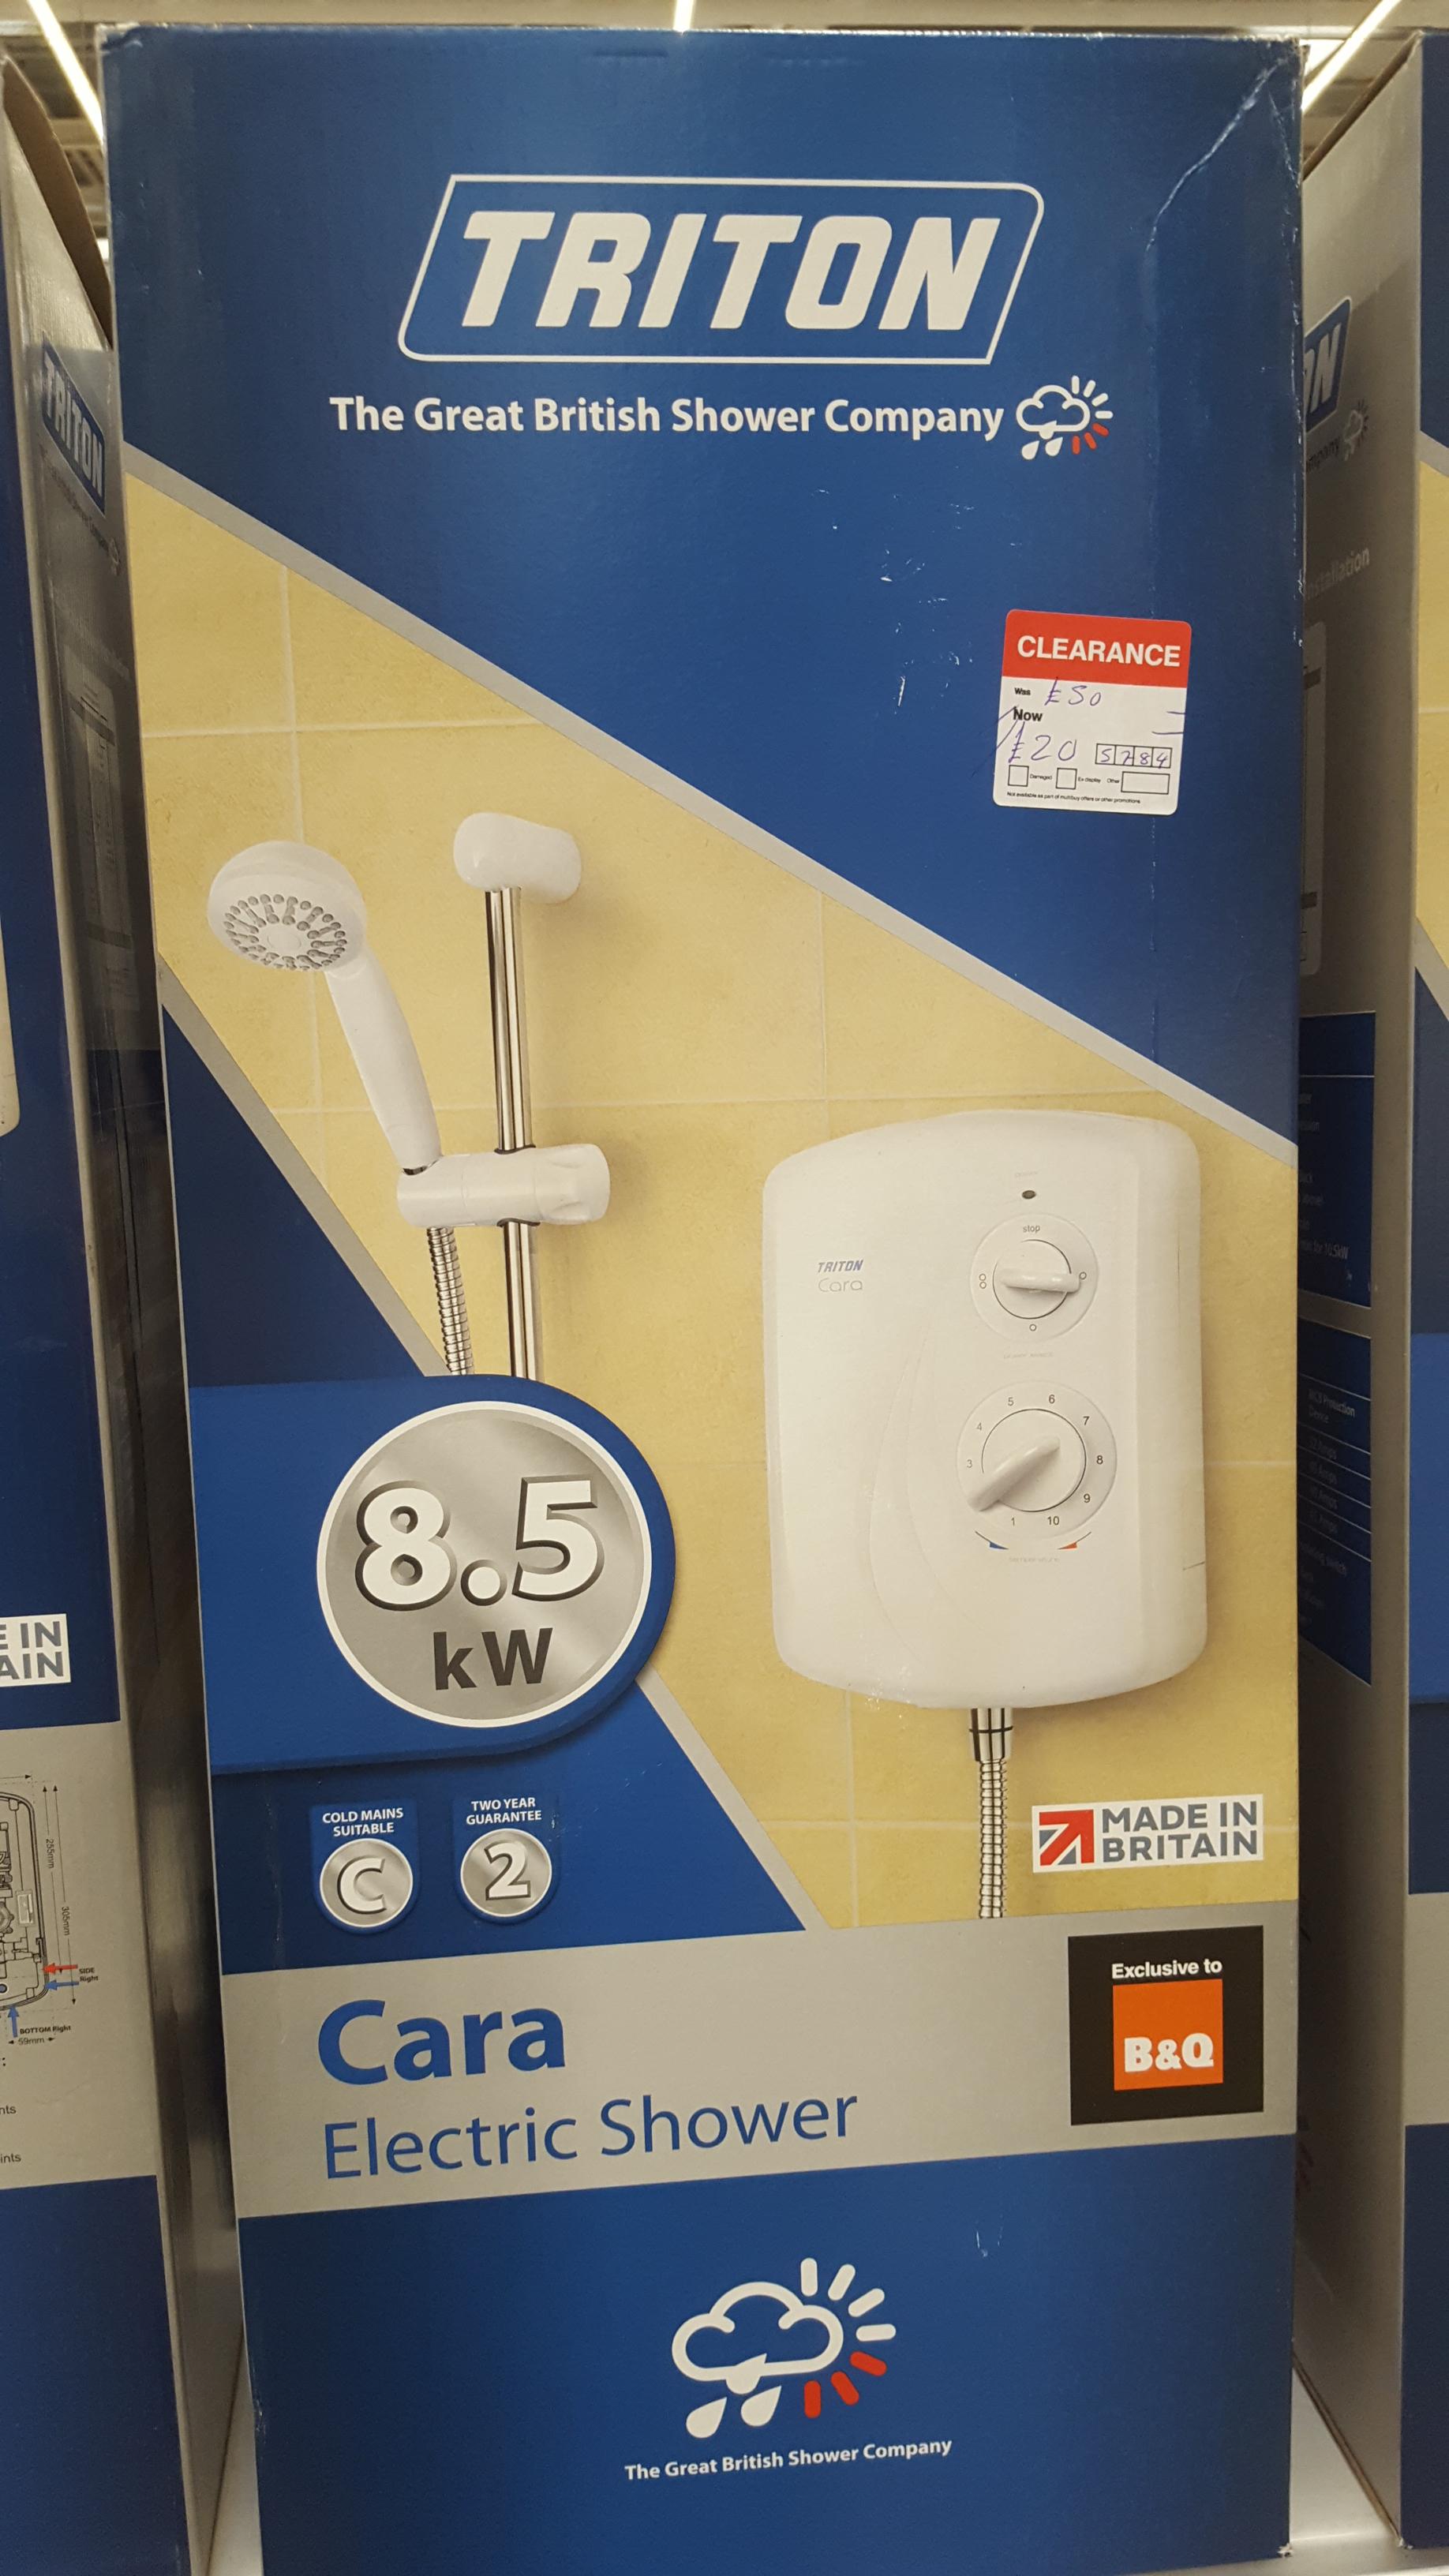 Triton Cara Electric shower 8.5kw - £20 instore @ B&Q - cribbs causeway